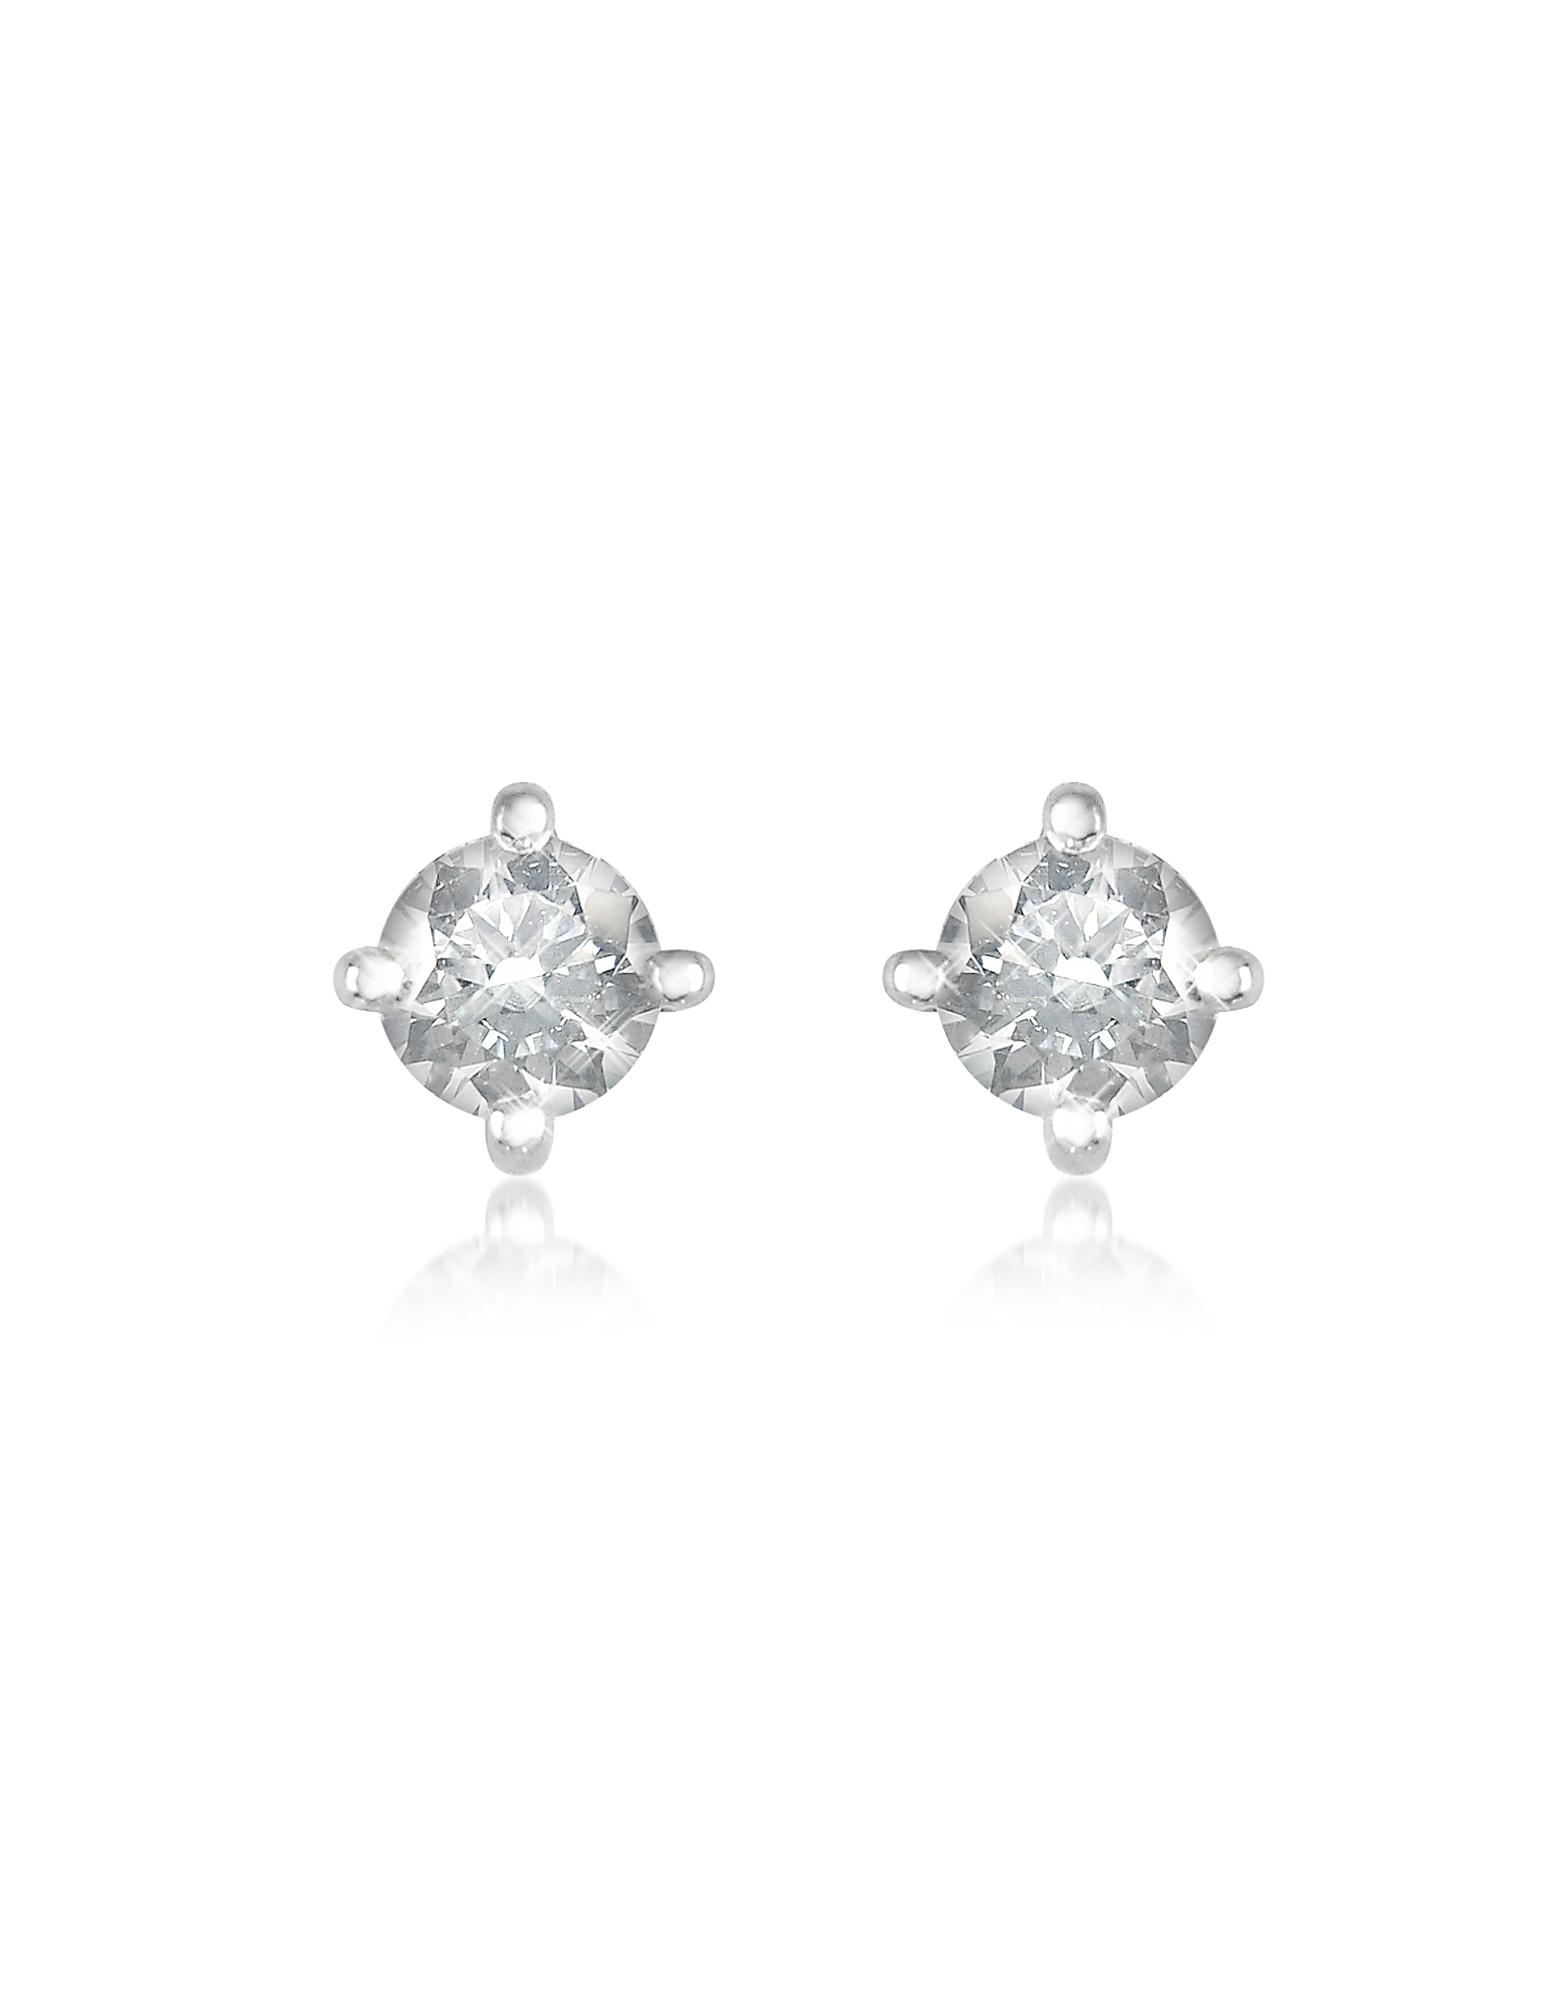 Forzieri Earrings, 0.37 ct Four-Prong Diamond Stud Earrings